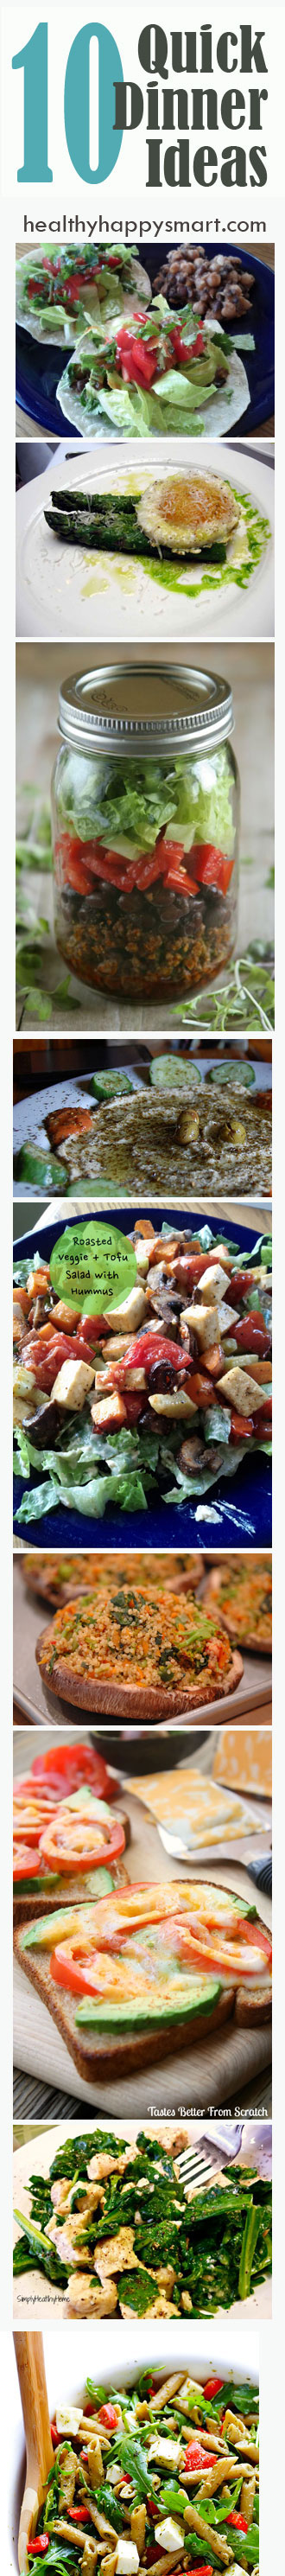 10 healthy + quick dinner ideas